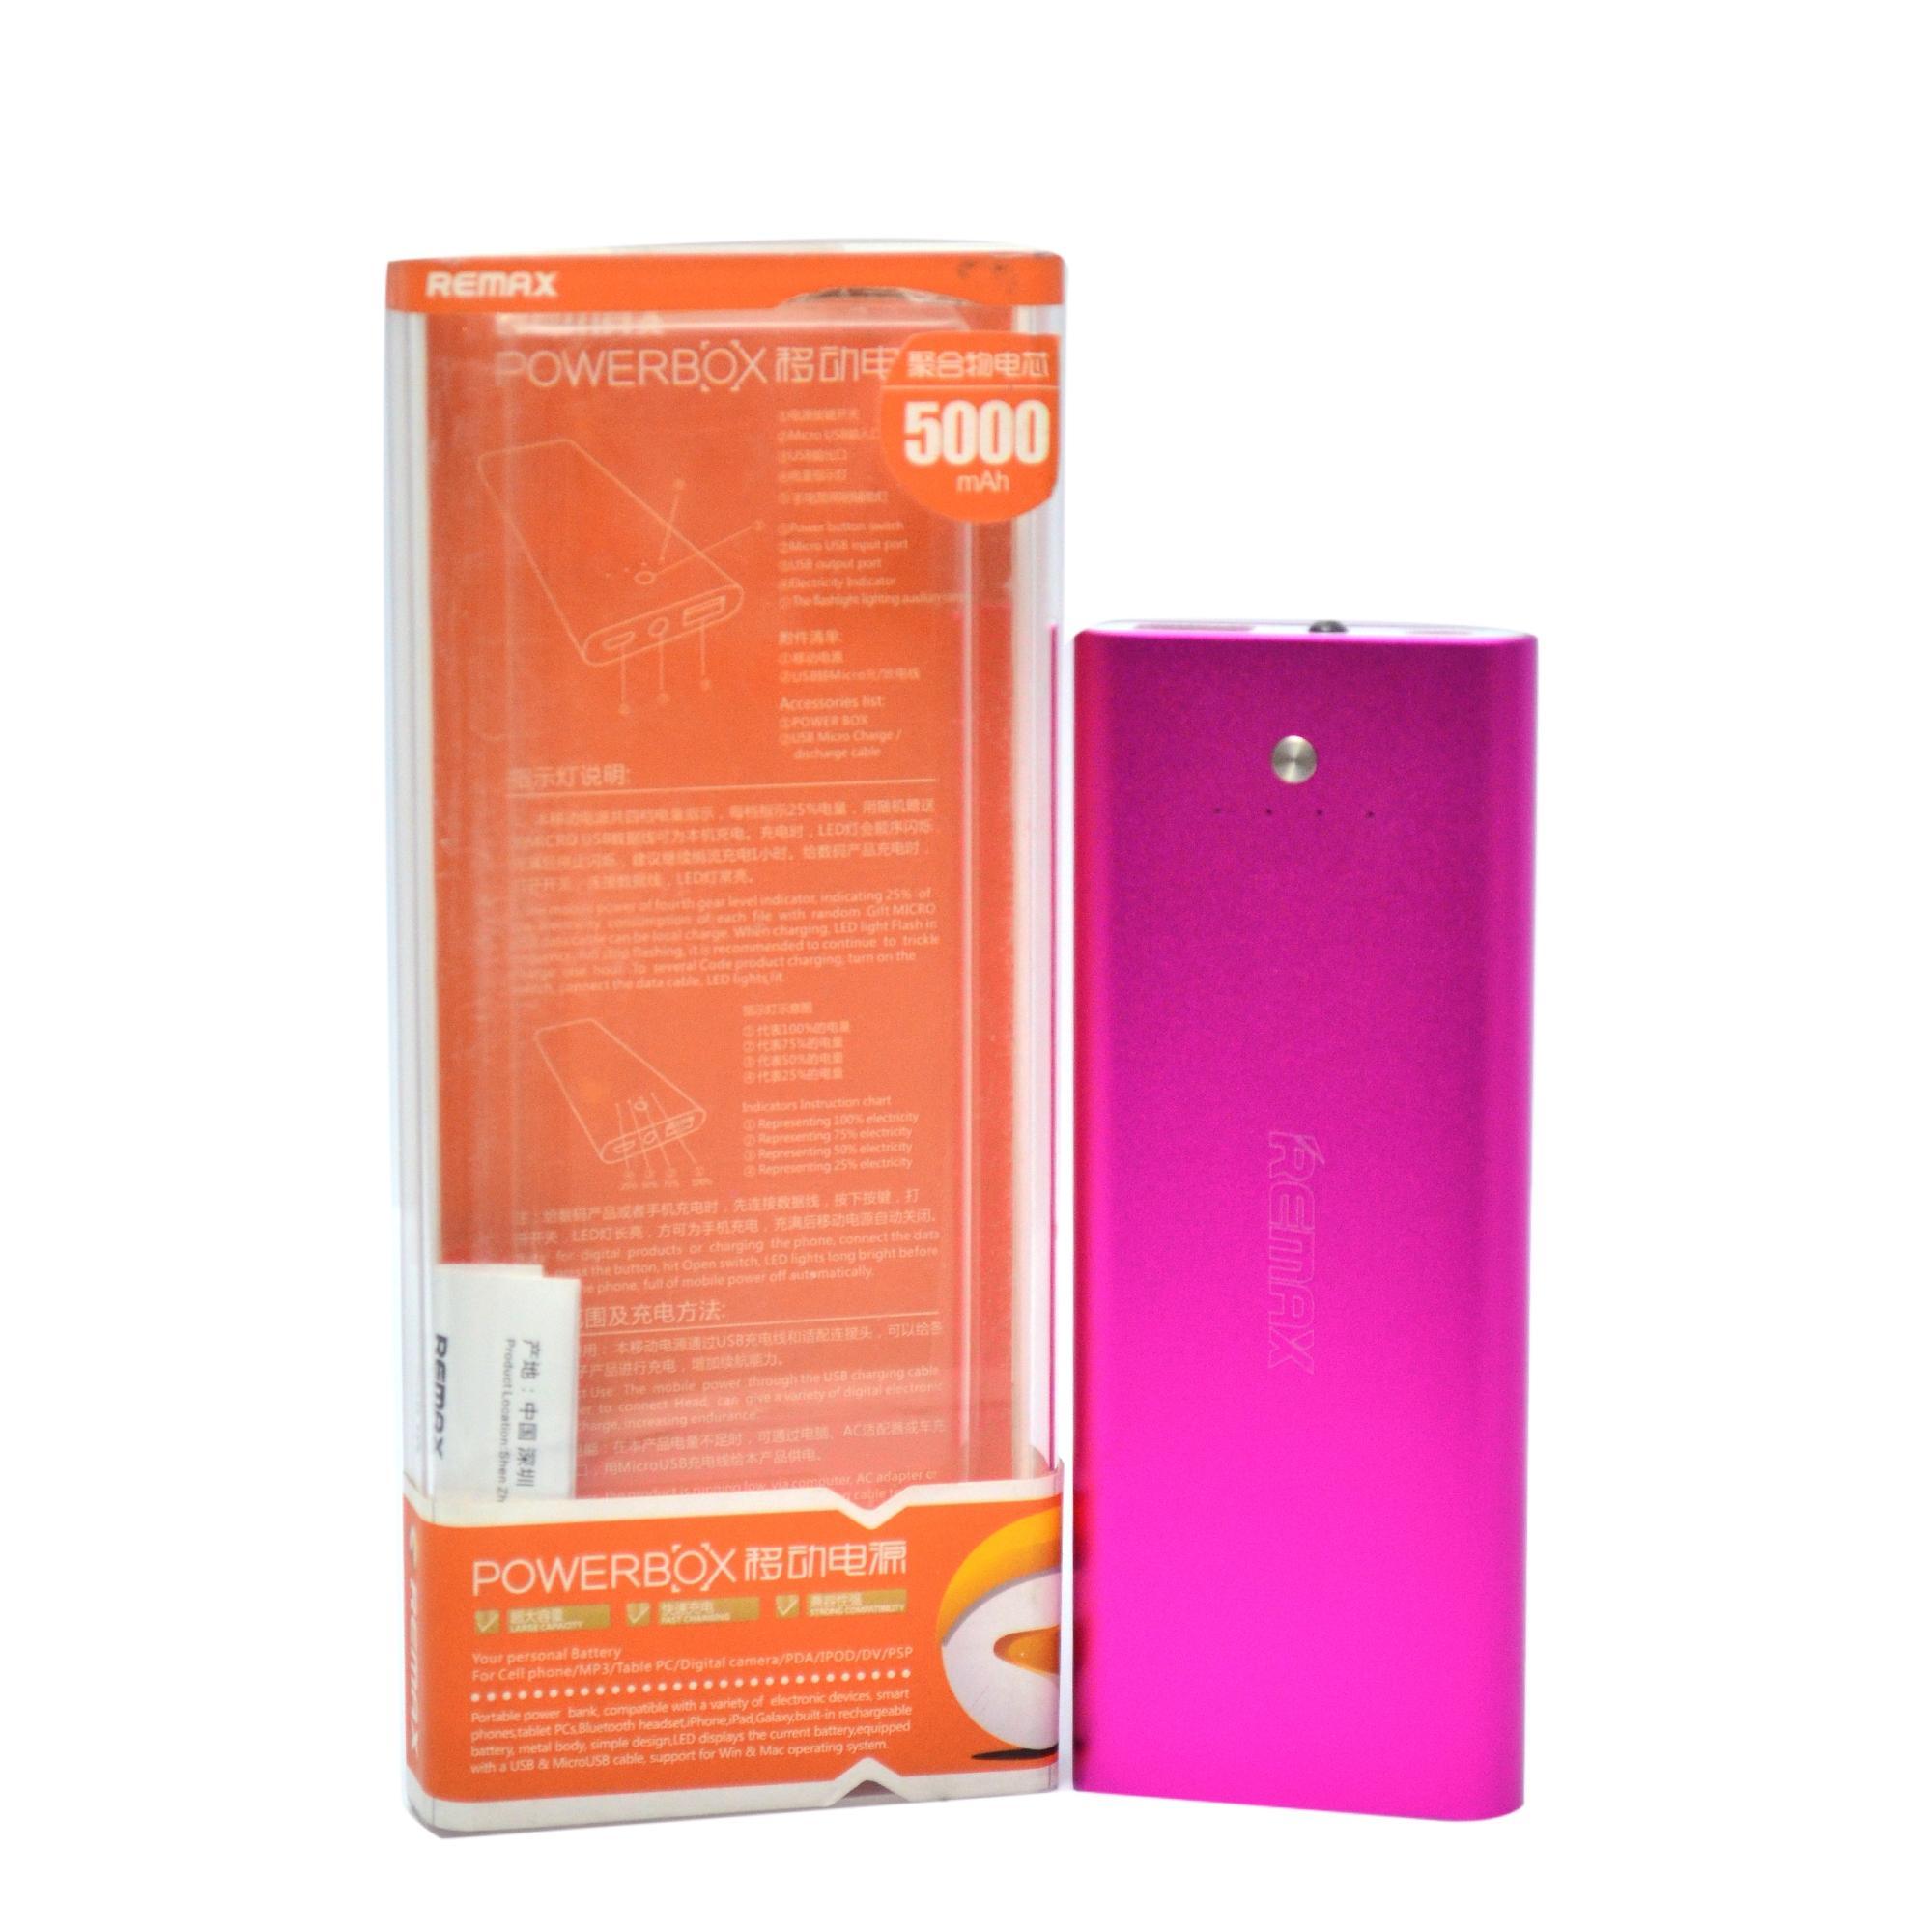 Remax 5000MAh Power Bank - Purple